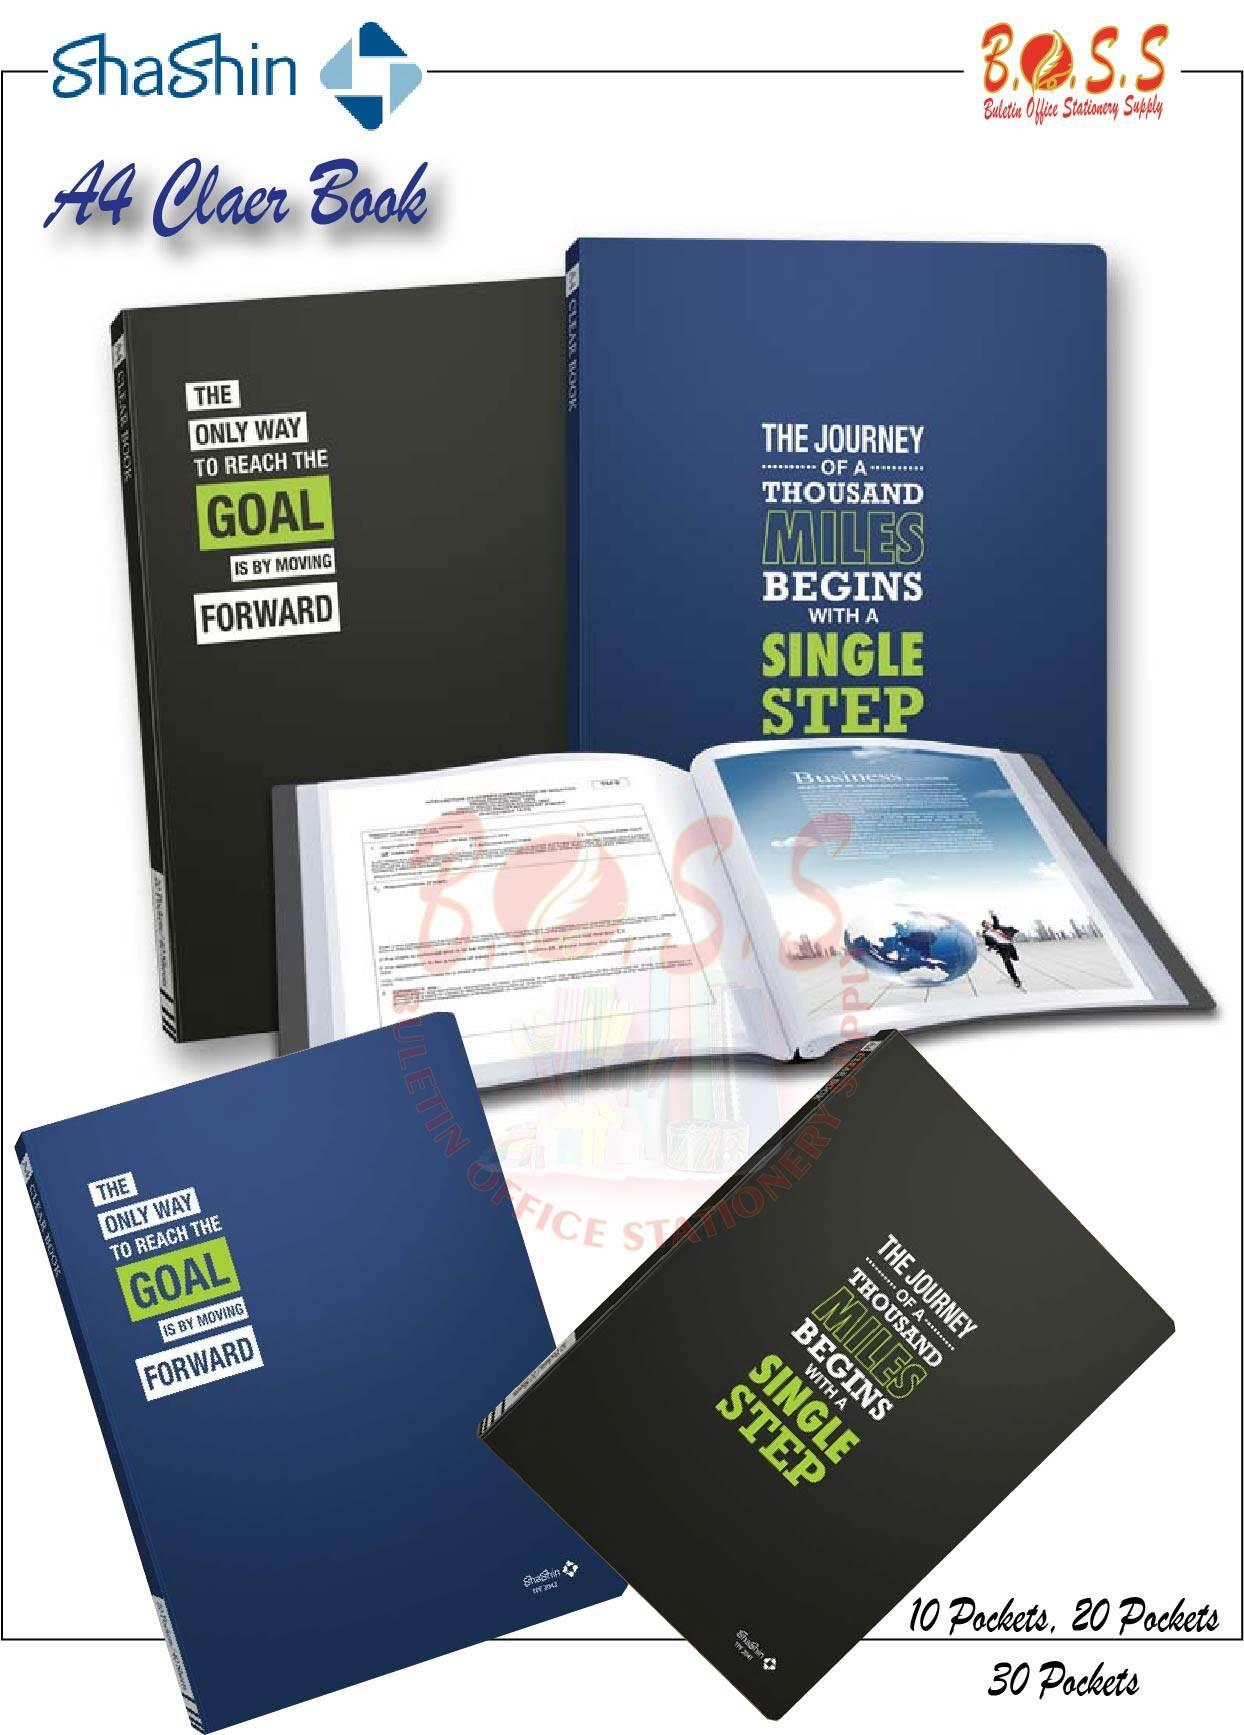 [Ready Stock]A4 Clear Book Document file 10 pockets, 20 pockets, 30 pockets